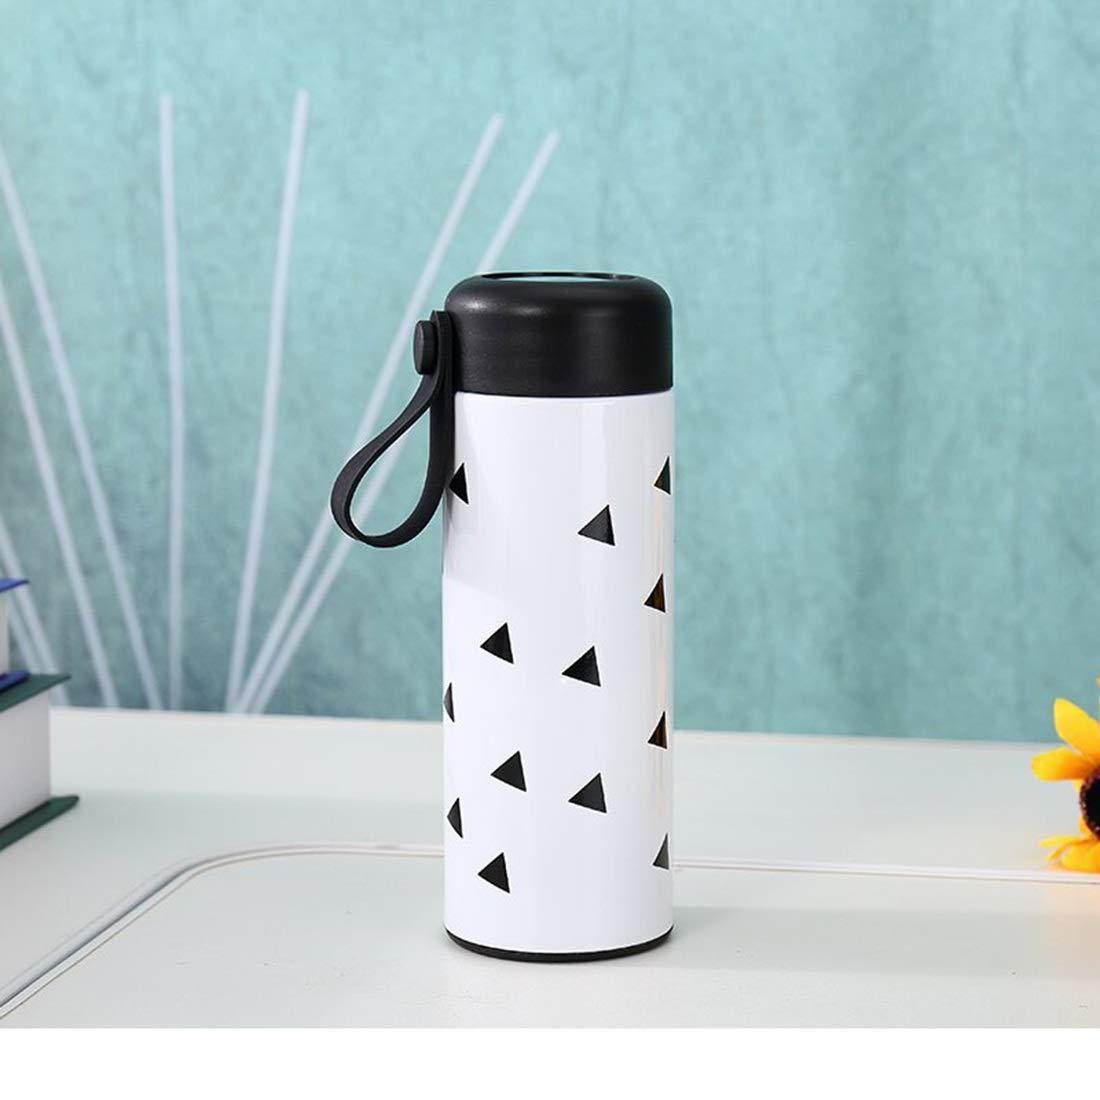 SHIZHESHOP Tragbarer Wasserglas-Vakuum-Edelstahl-Thermosbecher B07M5QYTFF | | | Komfort  a31b20